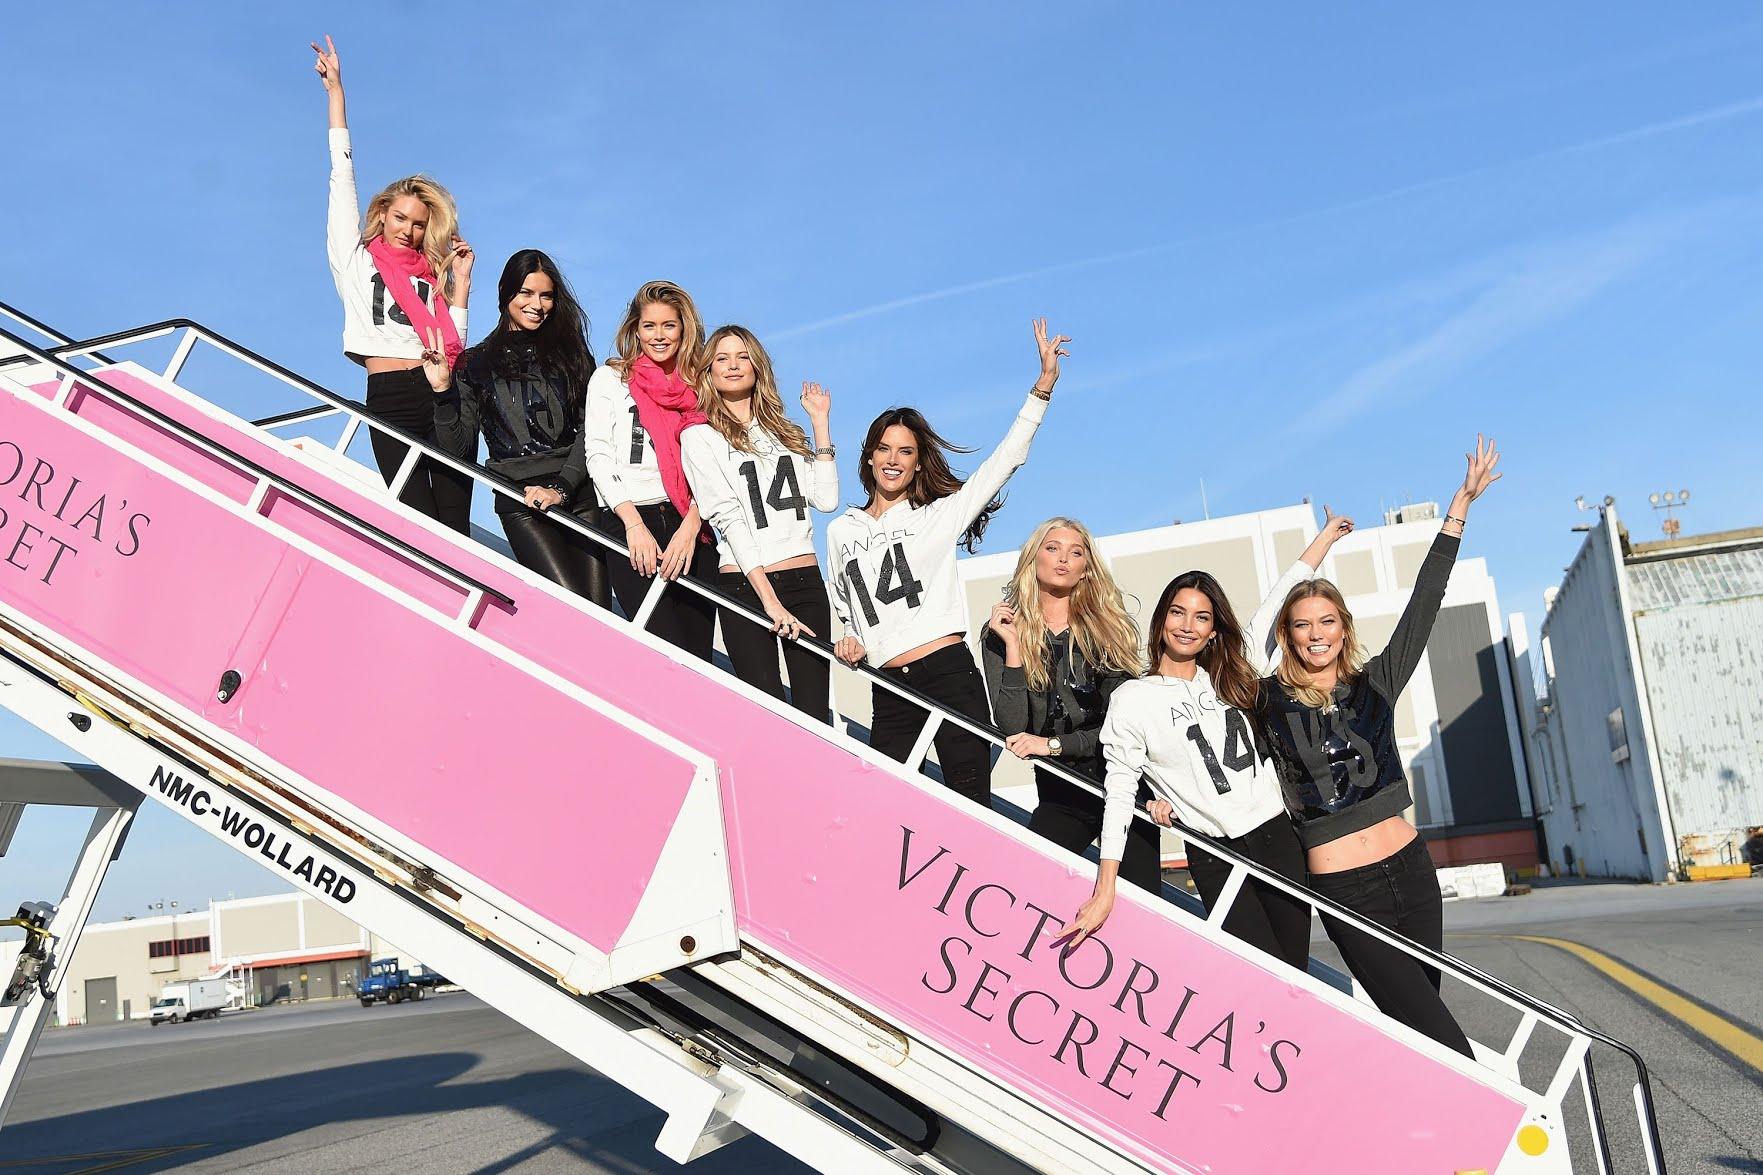 Victoria's Secret model plane